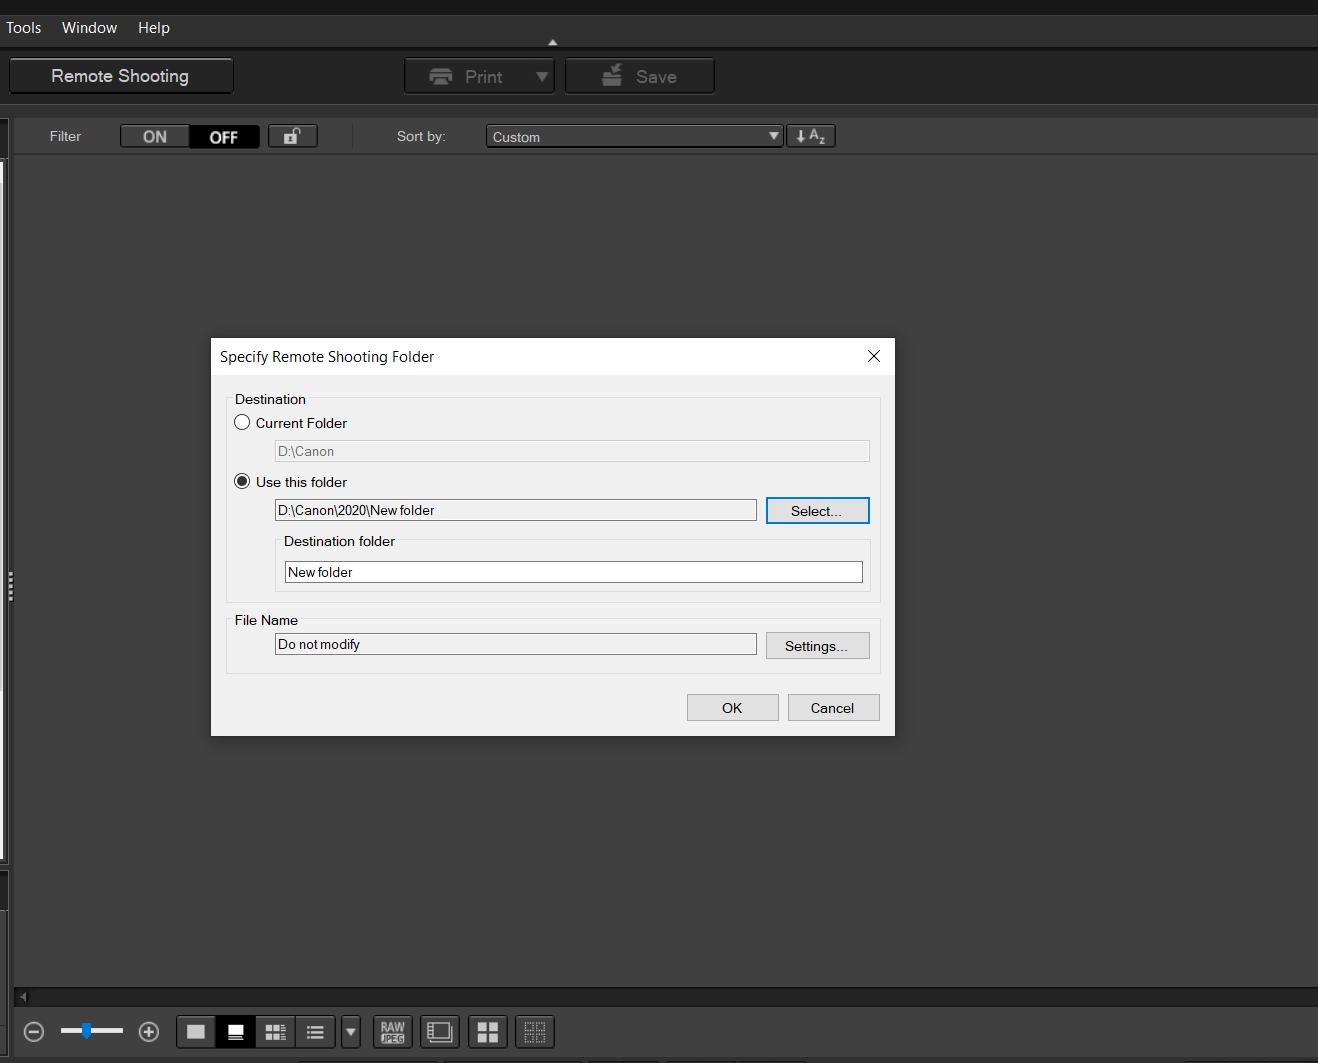 Canon_DPP4_RemoteShooting.png